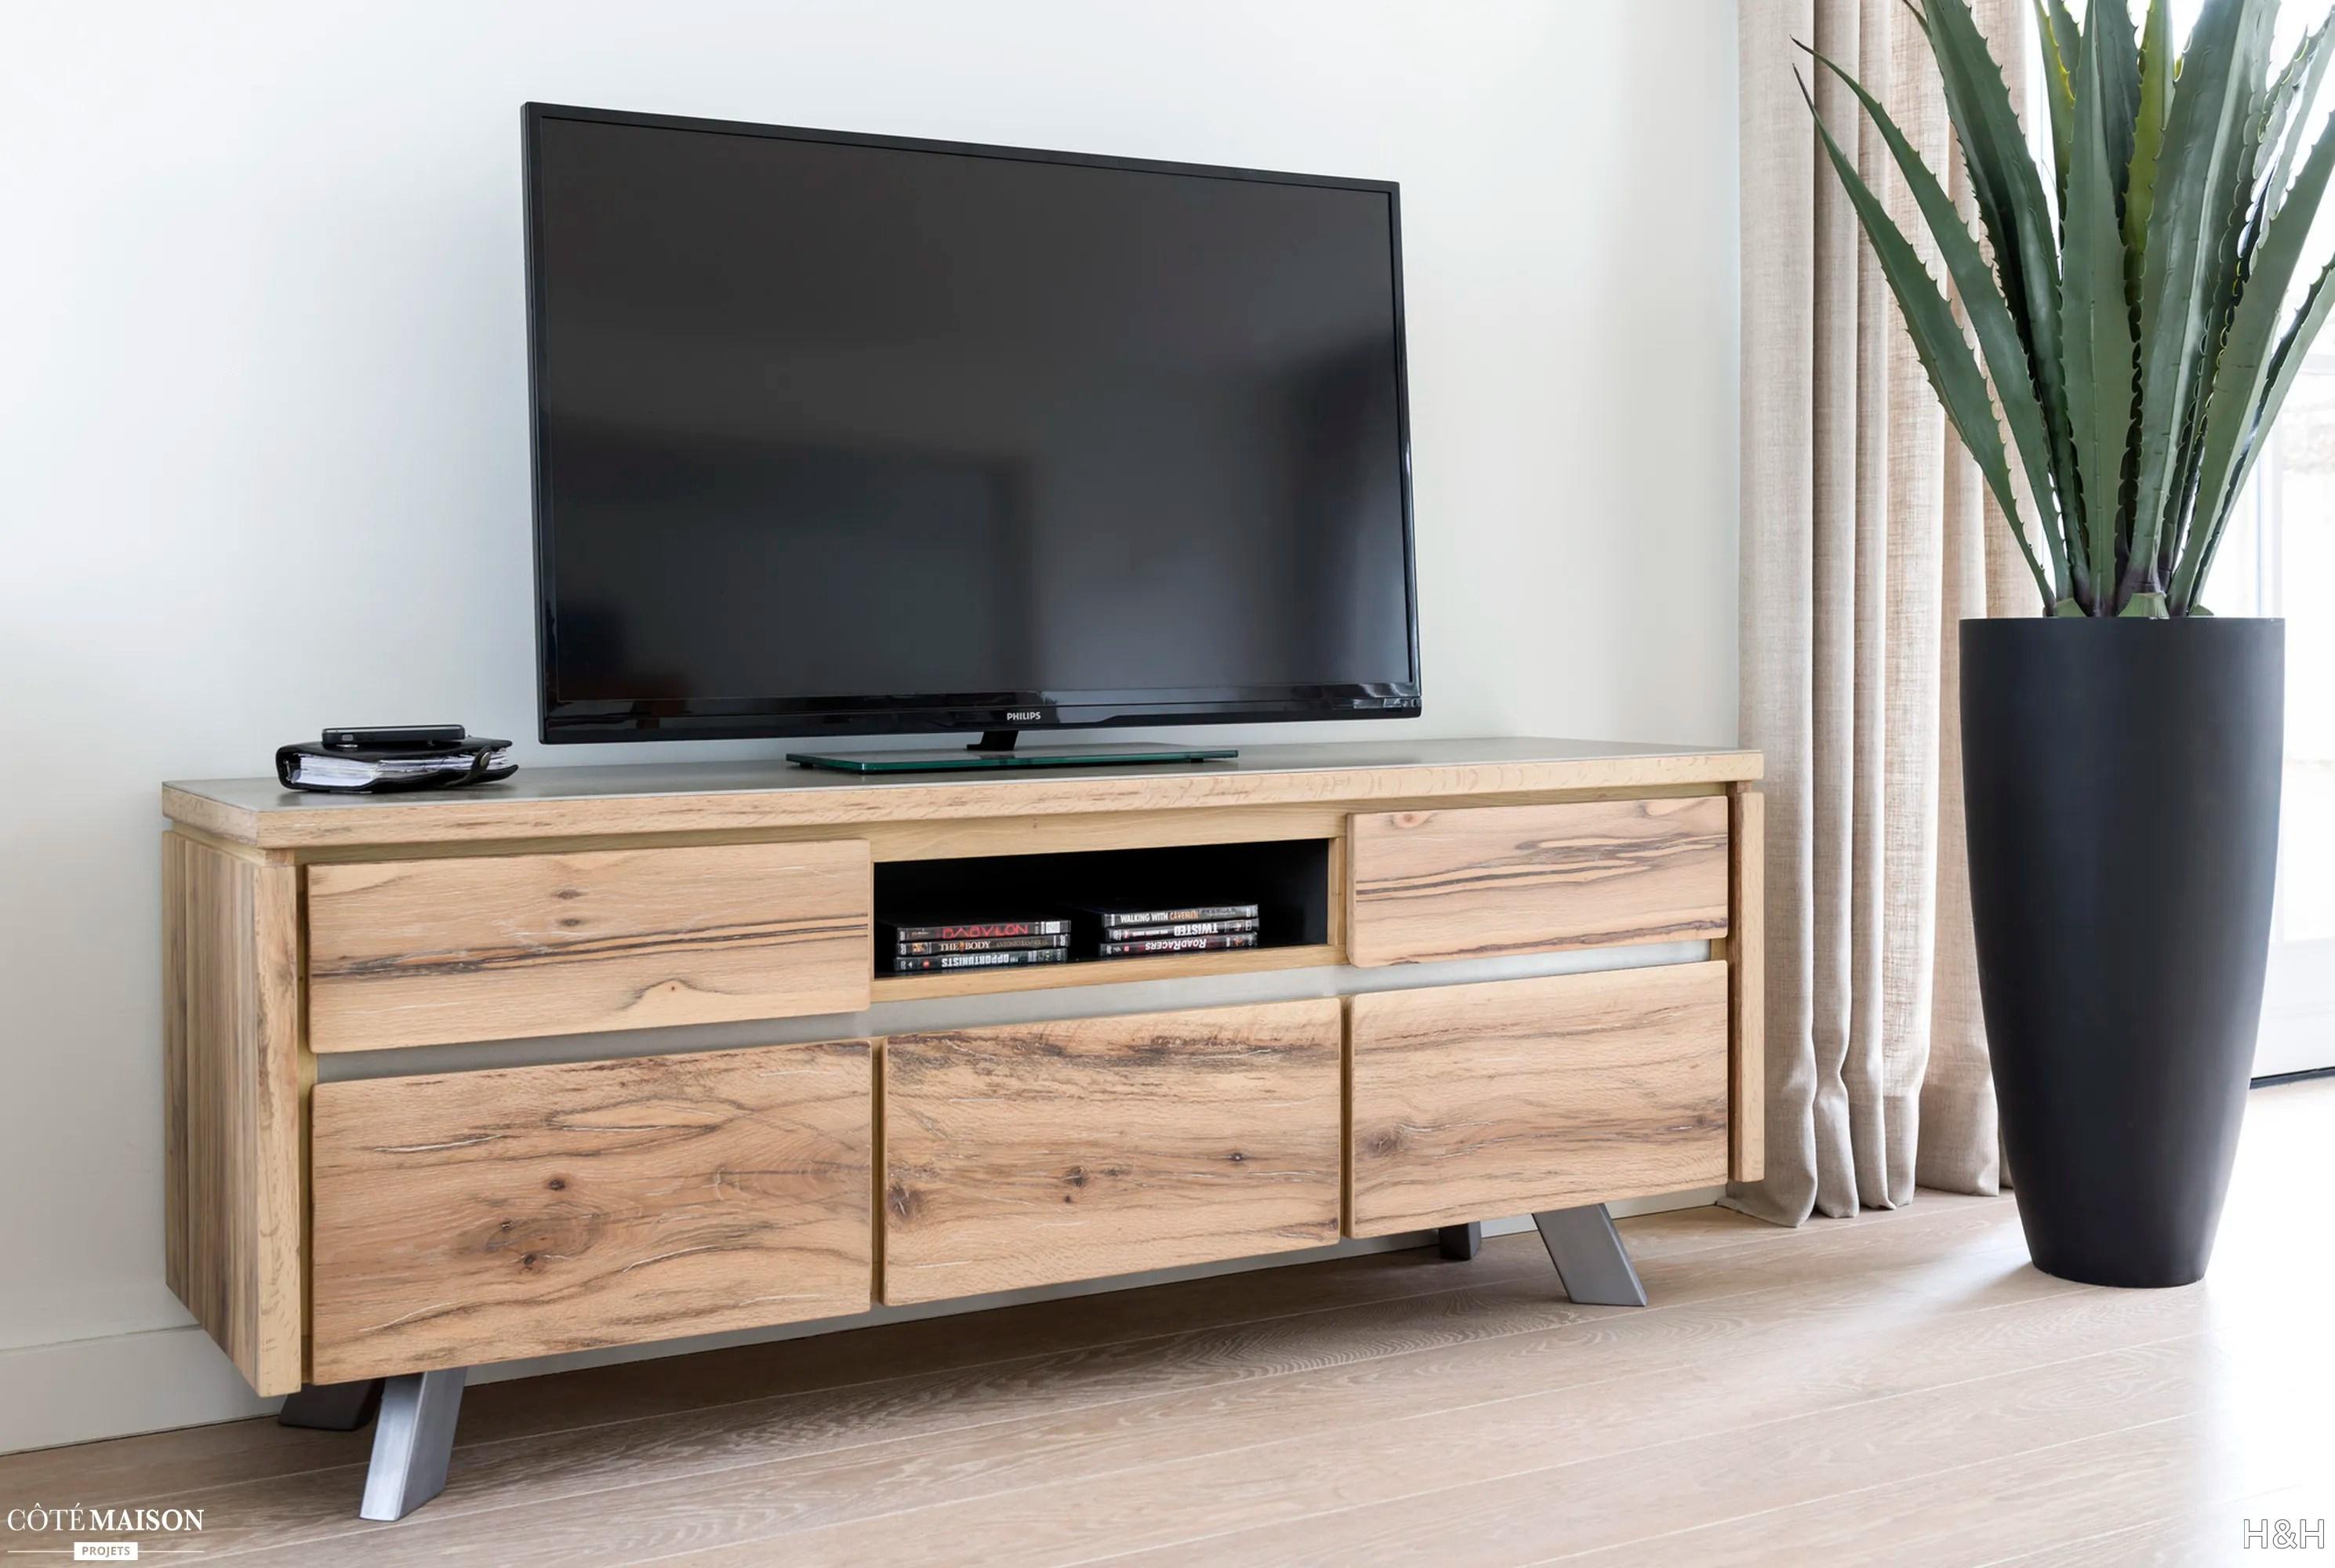 meuble tv h amp h h amp h cote maison